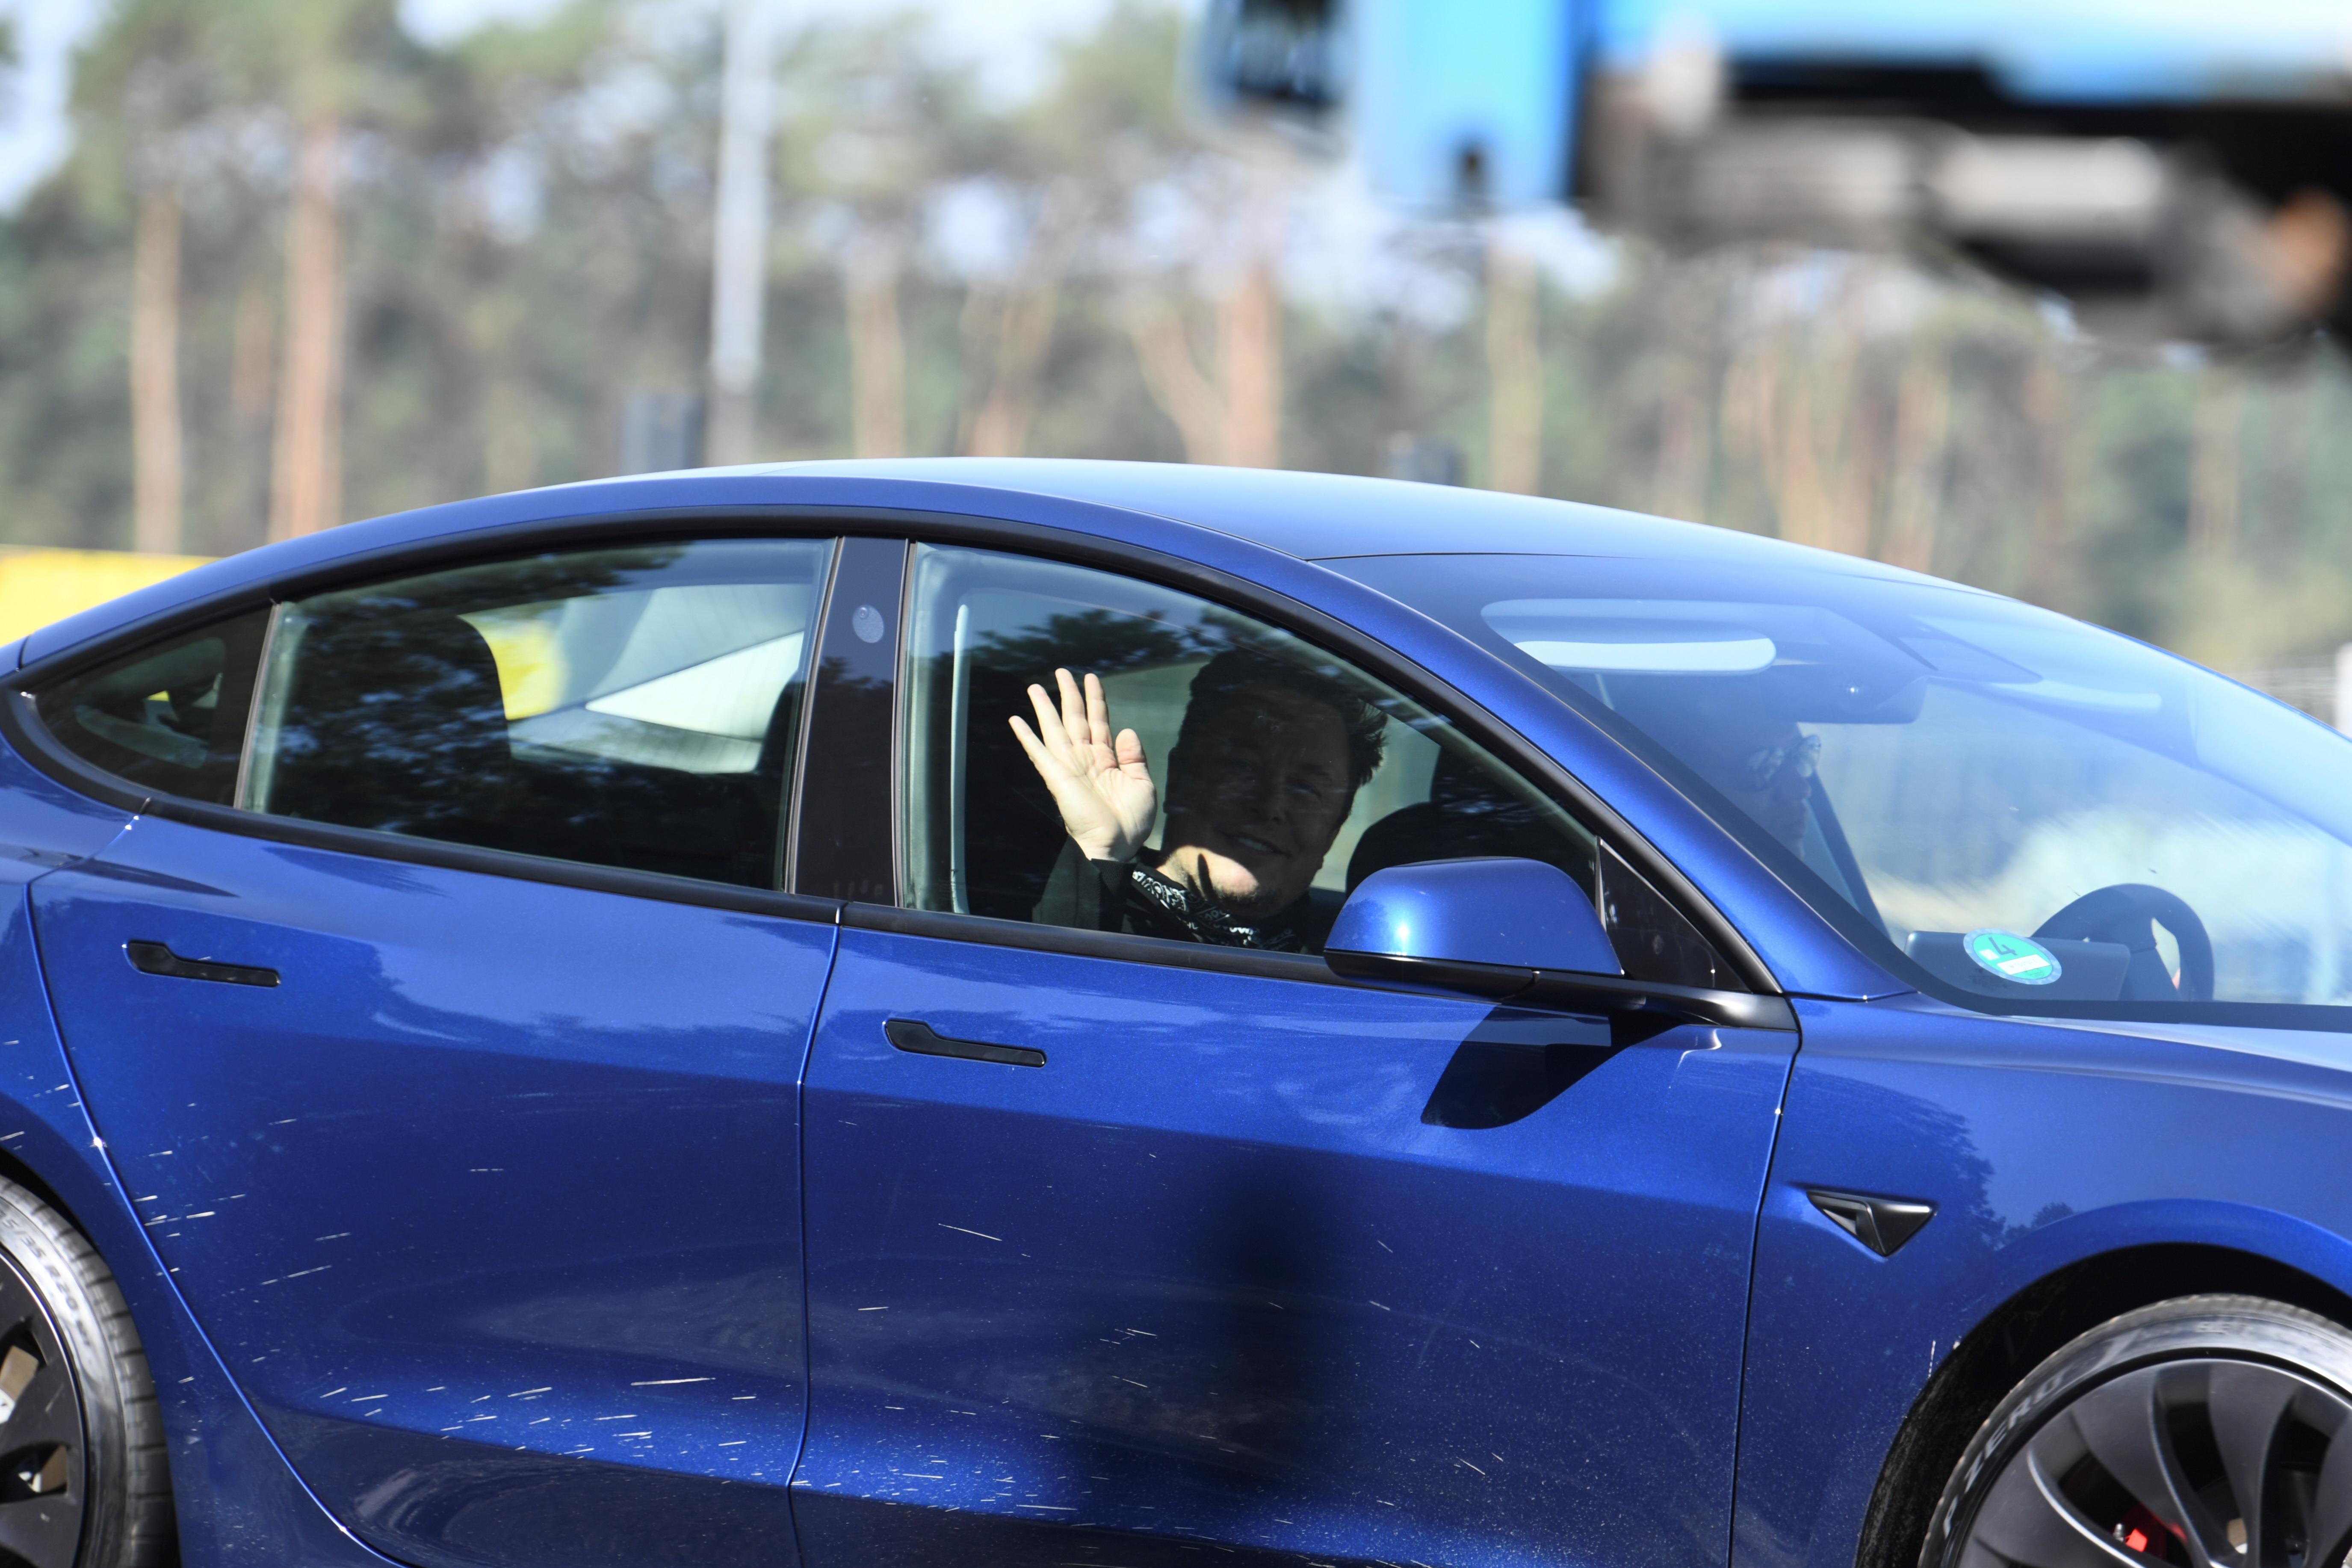 Tesla CEO Elon Musk gestures as he arrives at the construction site of Tesla's Gigafactory in Gruenheide near Berlin, Germany, August 13, 2021.  REUTERS/Annegret Hilse